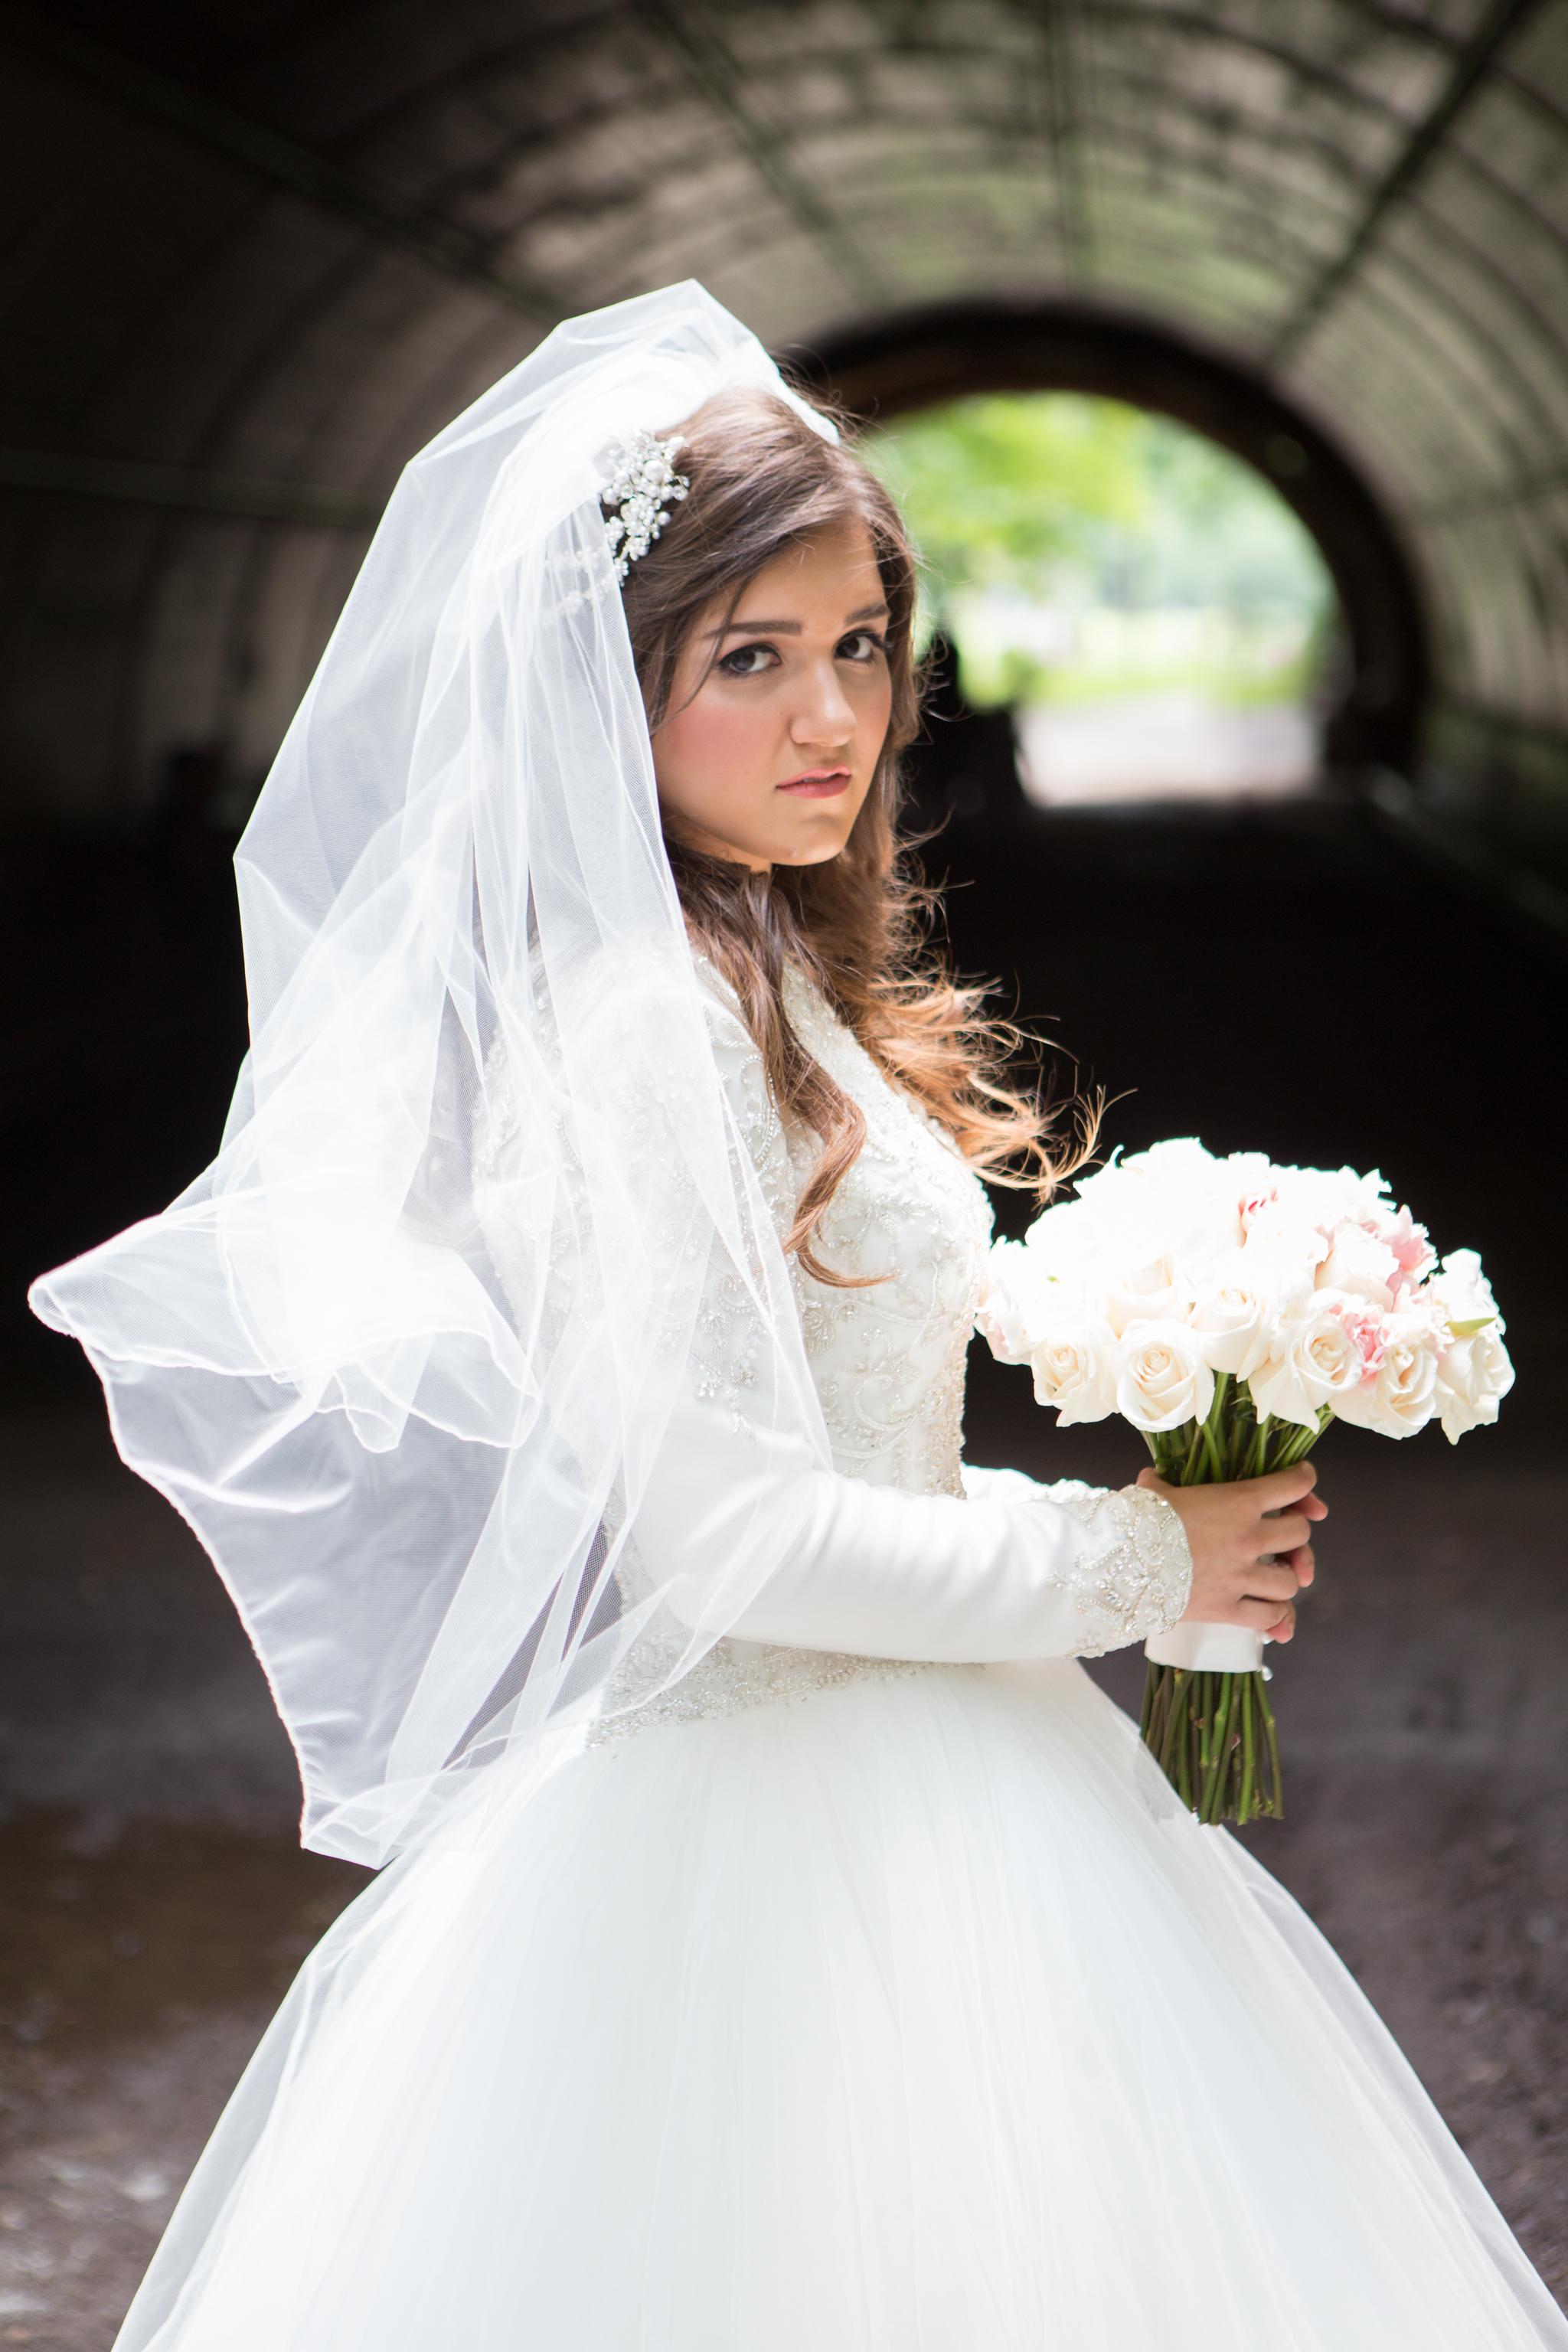 Wedding Iossi and Gitty Khafif  - Eliau Piha studio photography, new york, events, people 770 brooklyn -0100.jpg